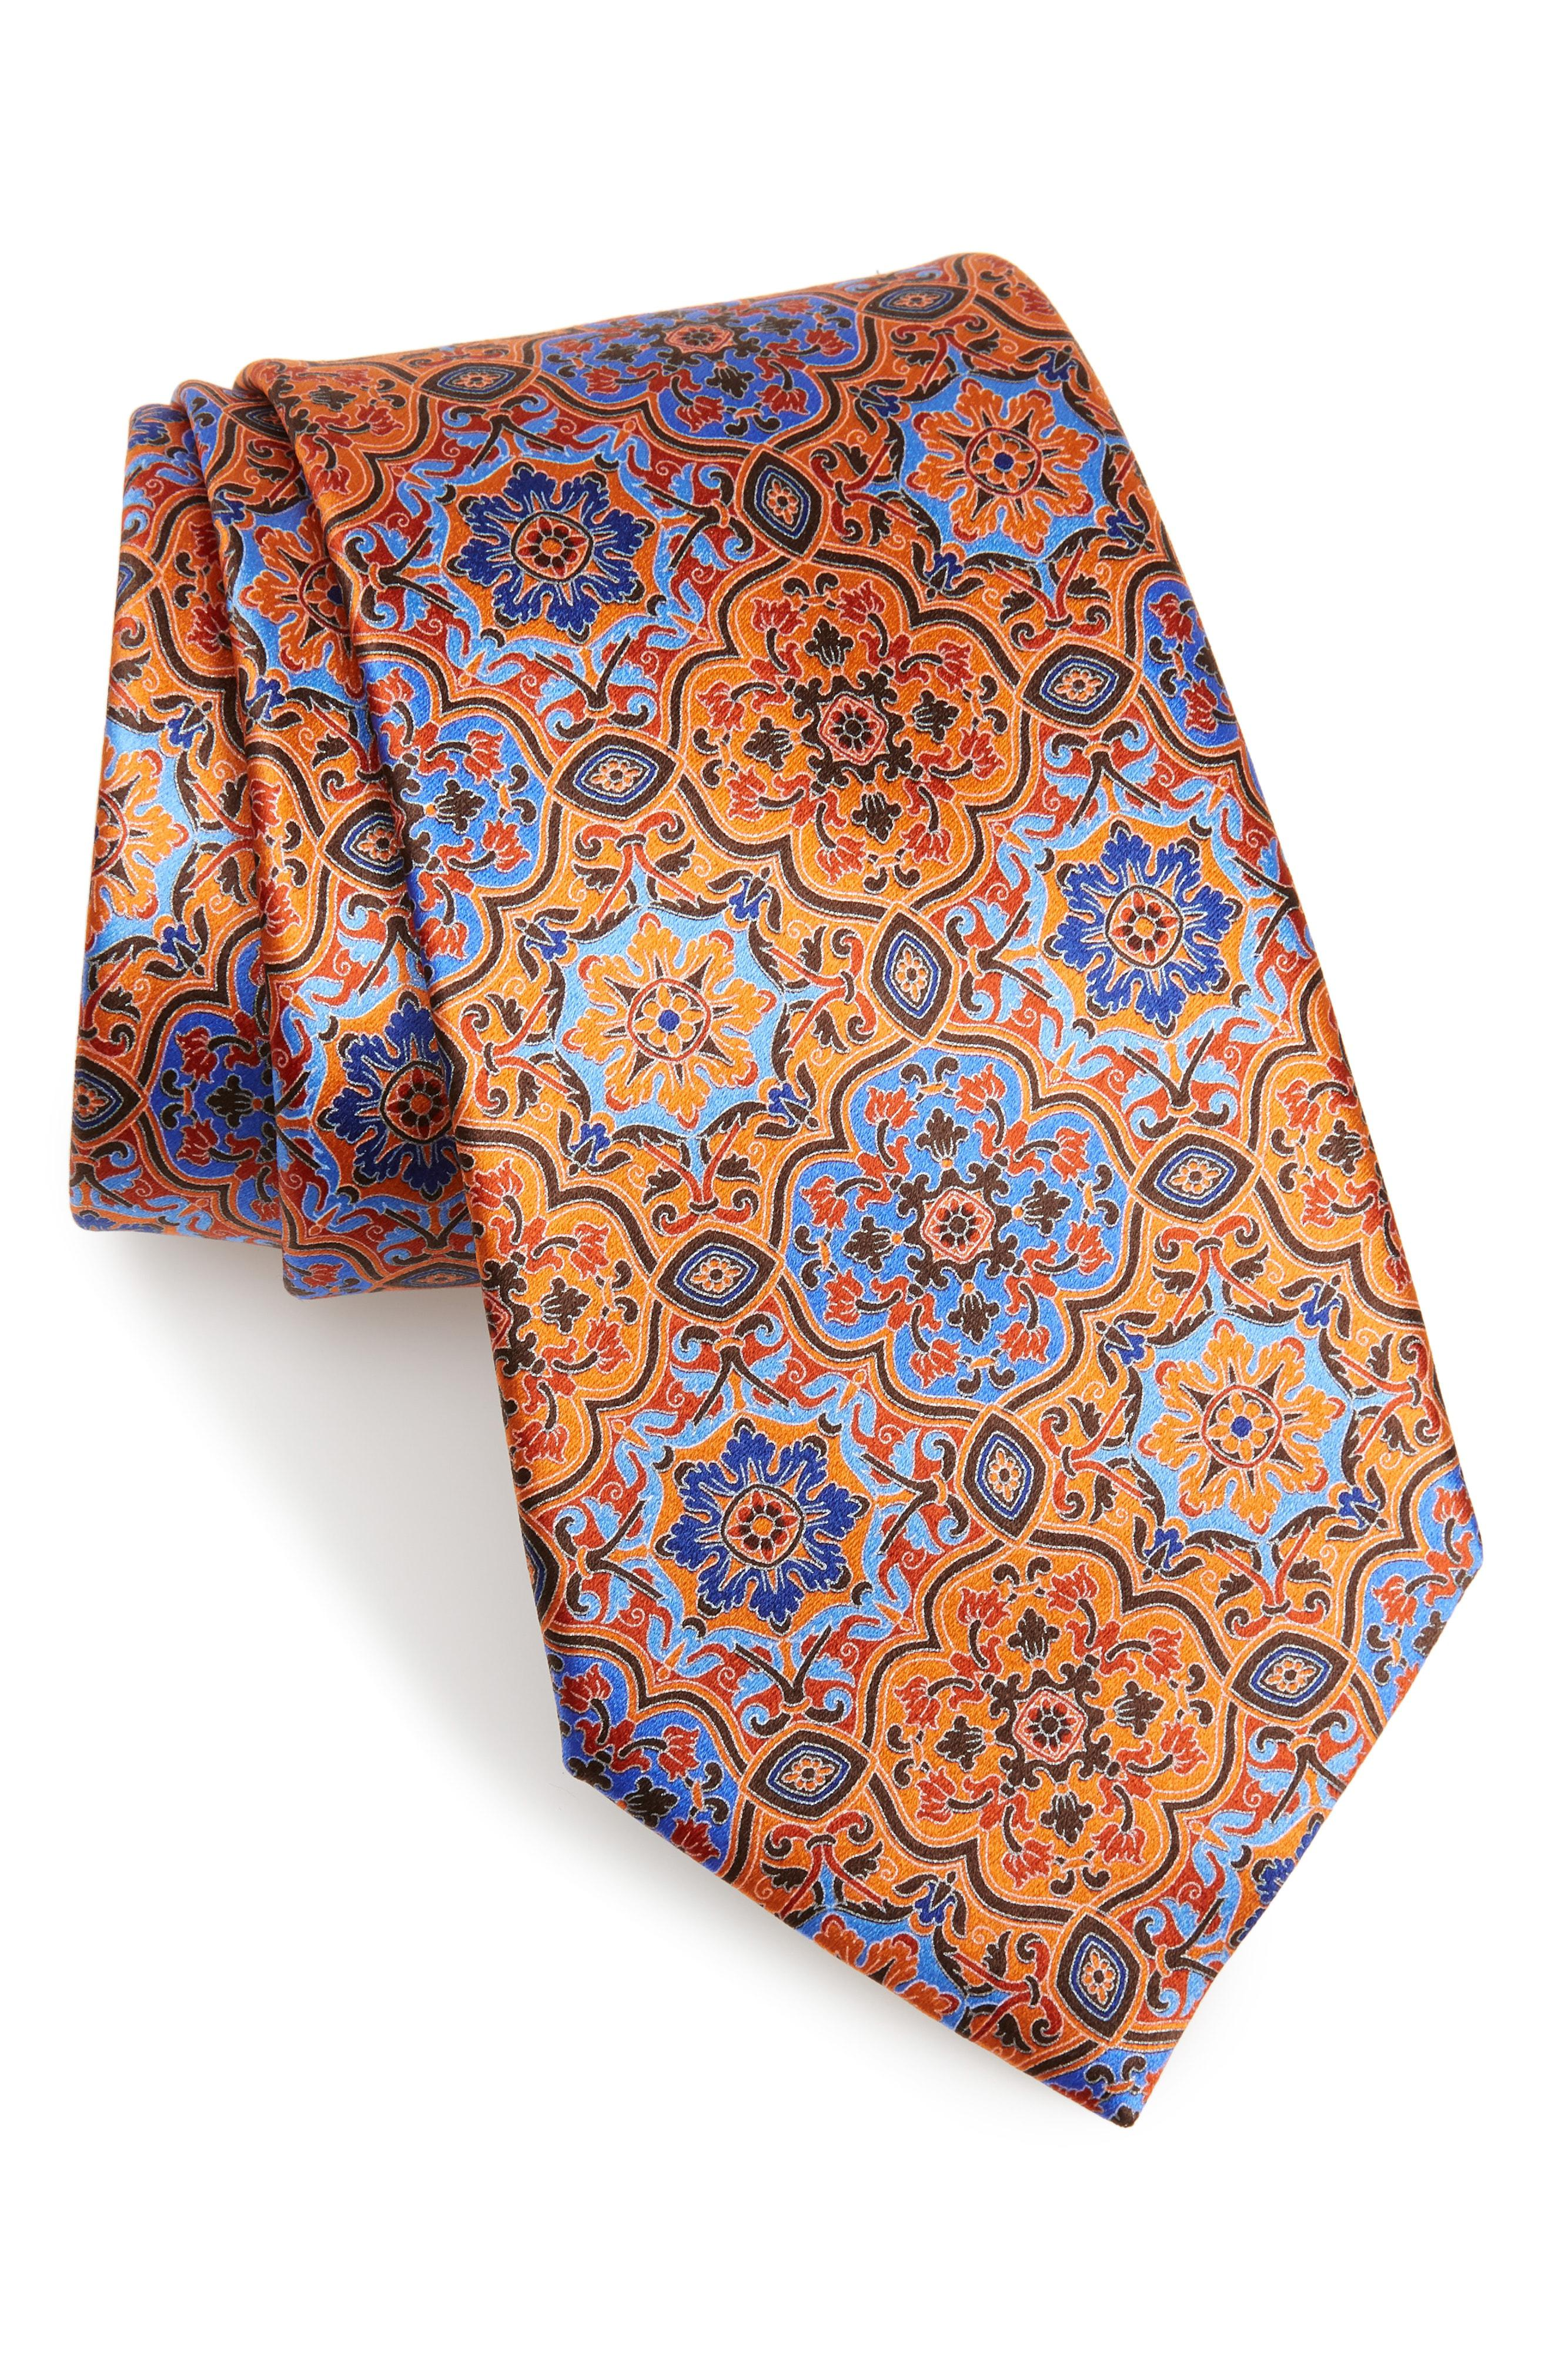 eb74ac83 Lyst - Ermenegildo Zegna Damask Silk Tie in Blue for Men